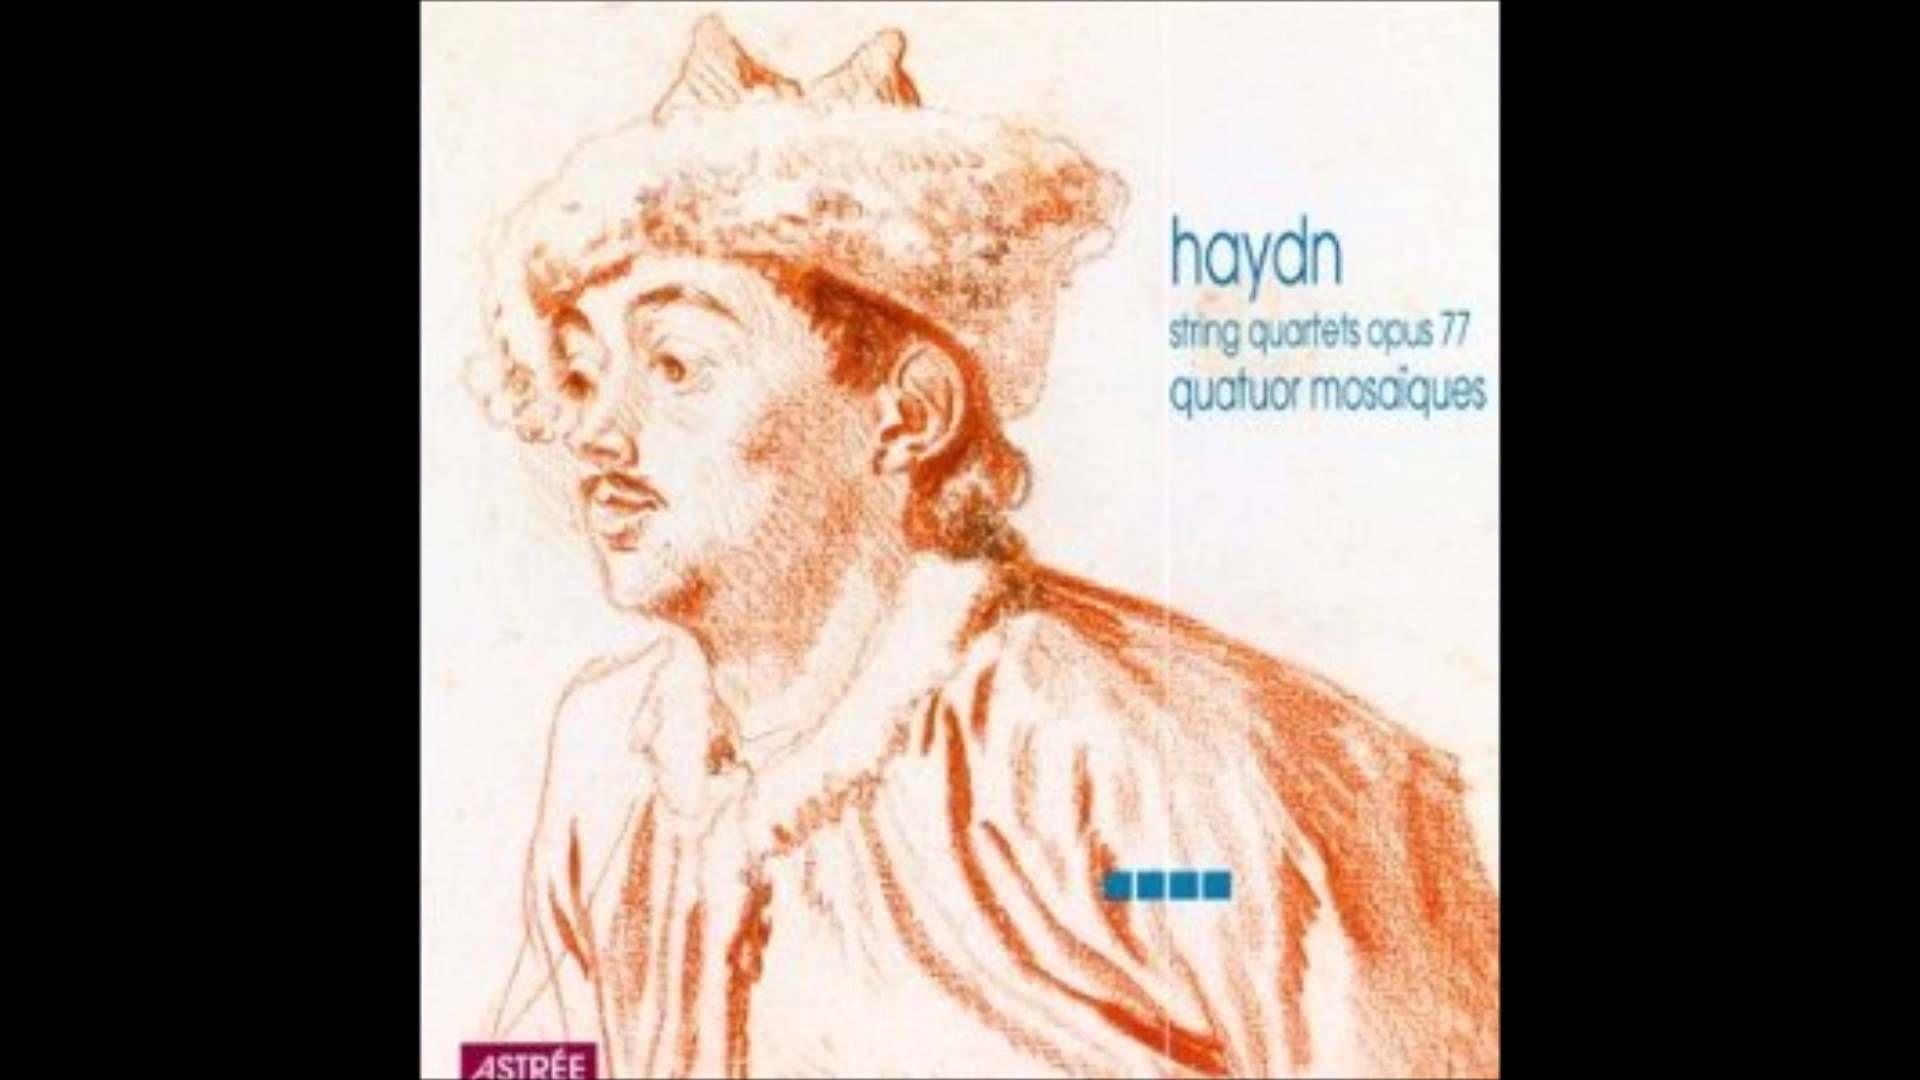 Haydn string quartets op.77